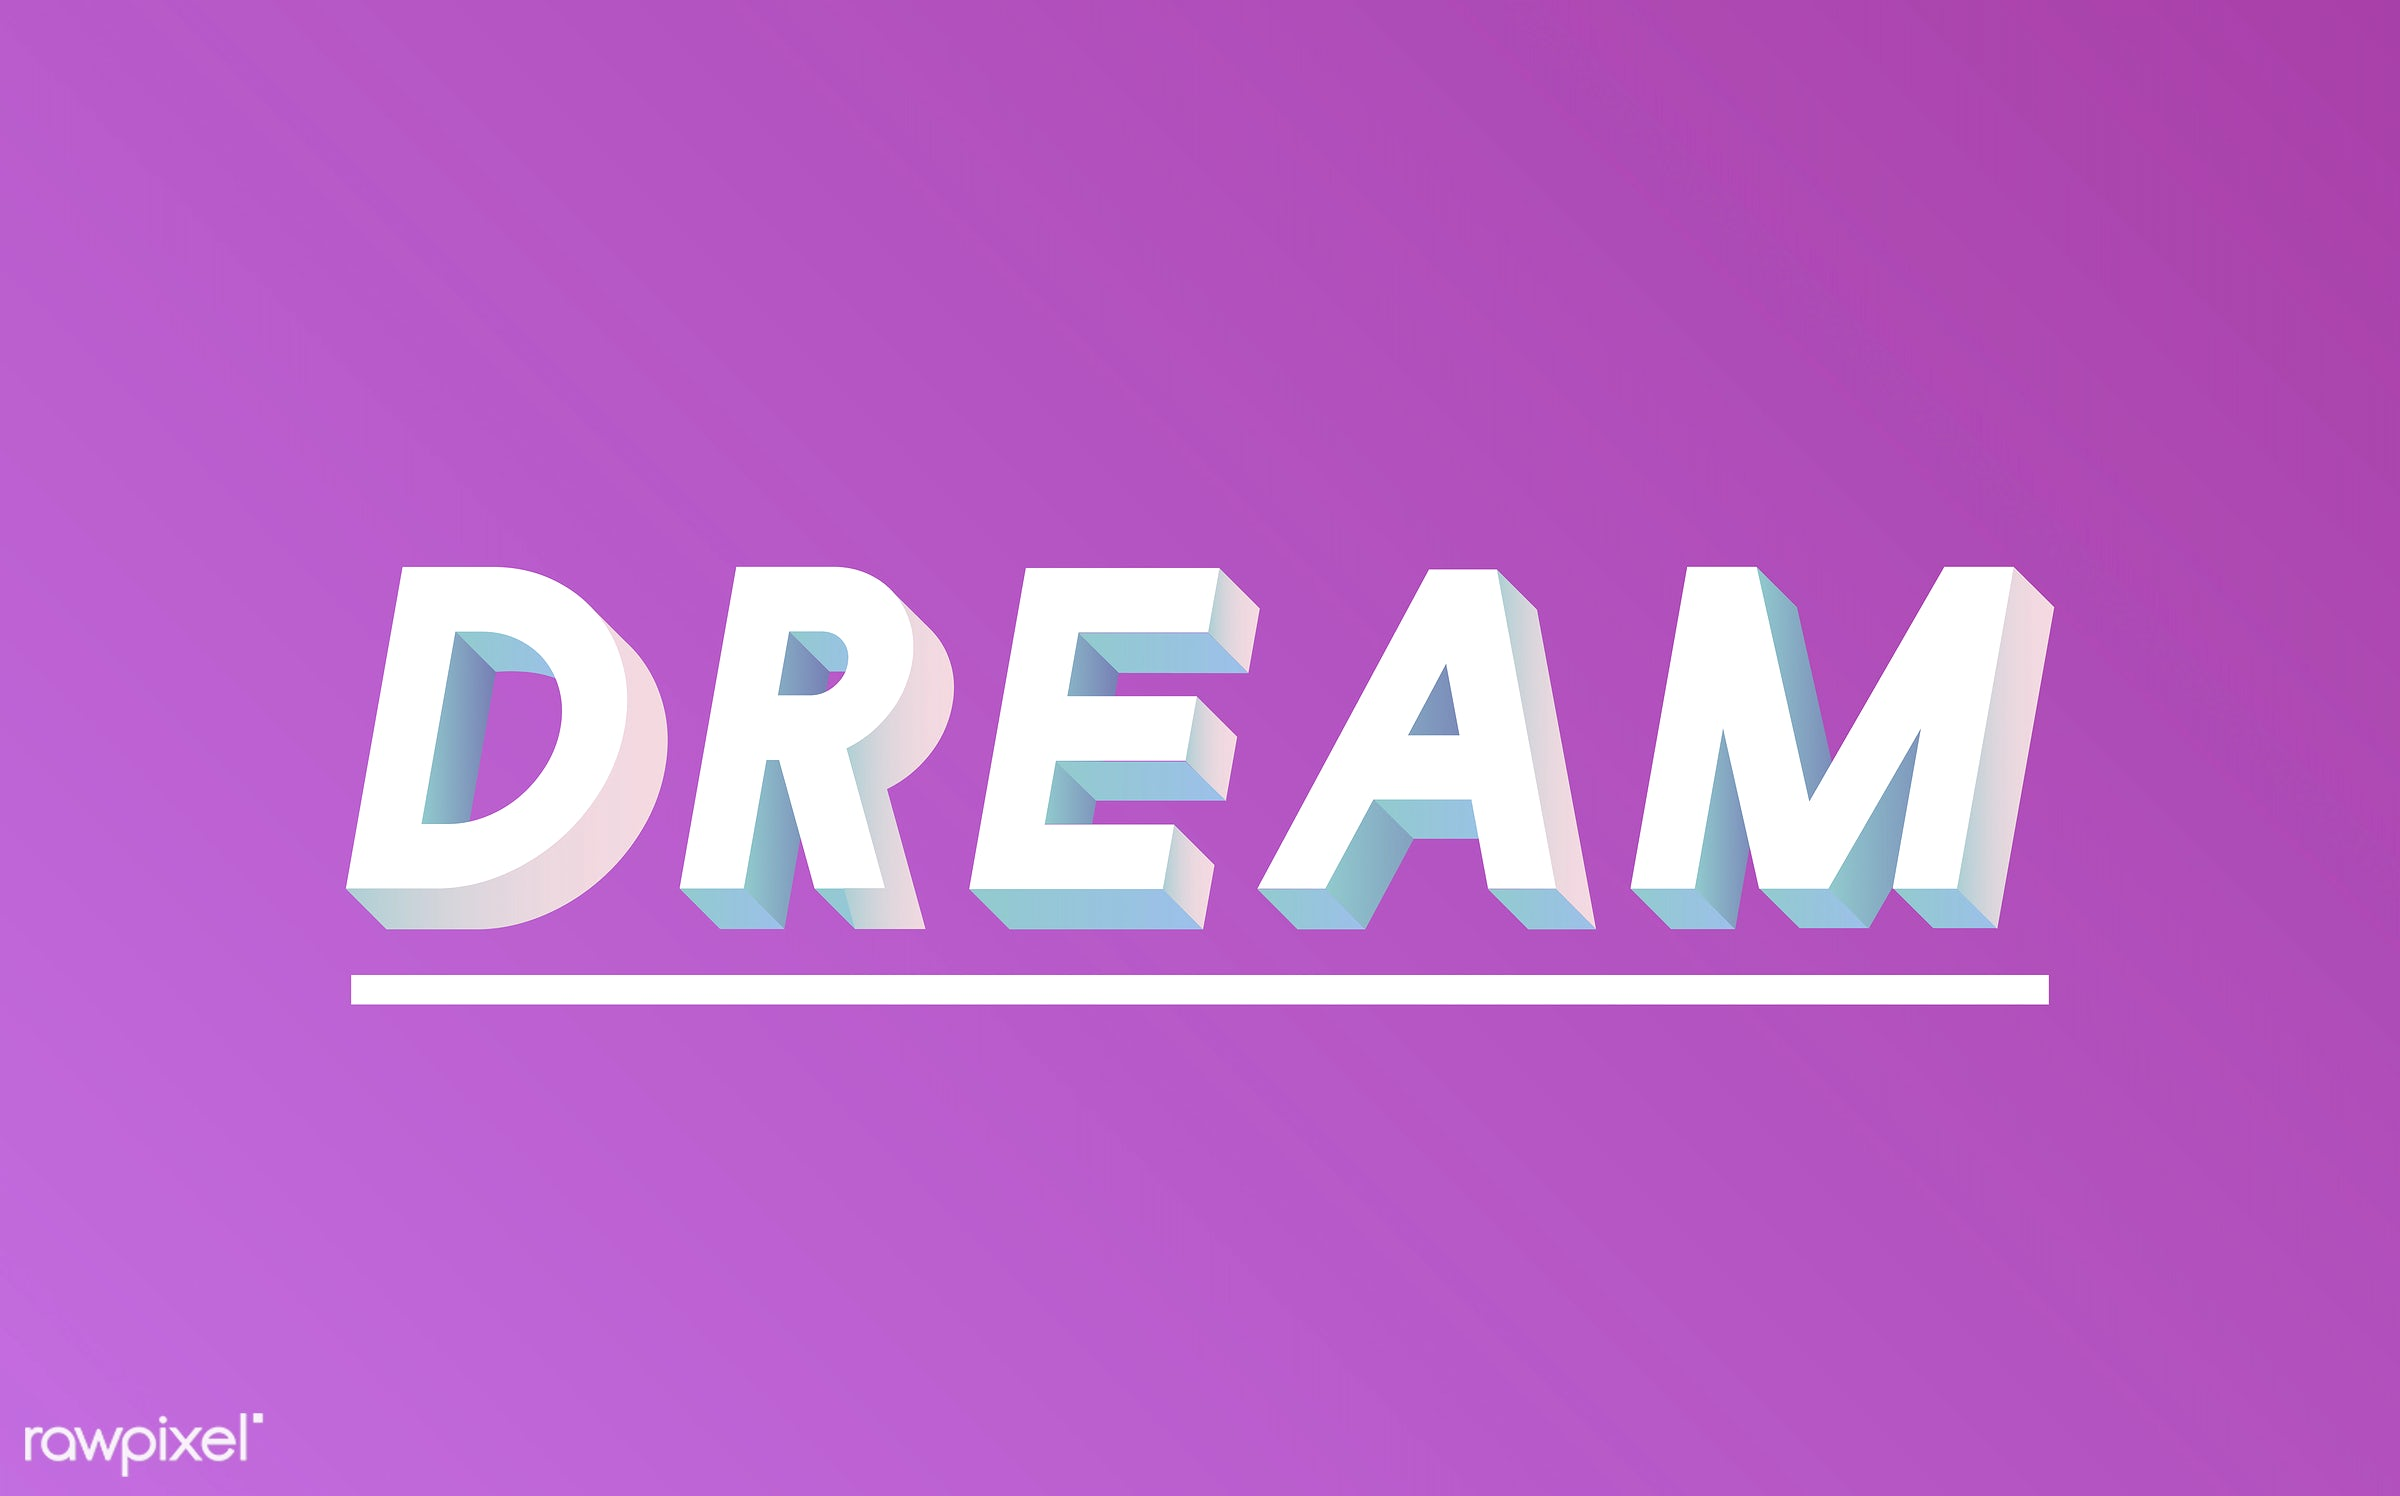 neon, colorful, 3d, three dimensional, vector, illustration, graphic, word, pink, white, dream, dreamer, dream big